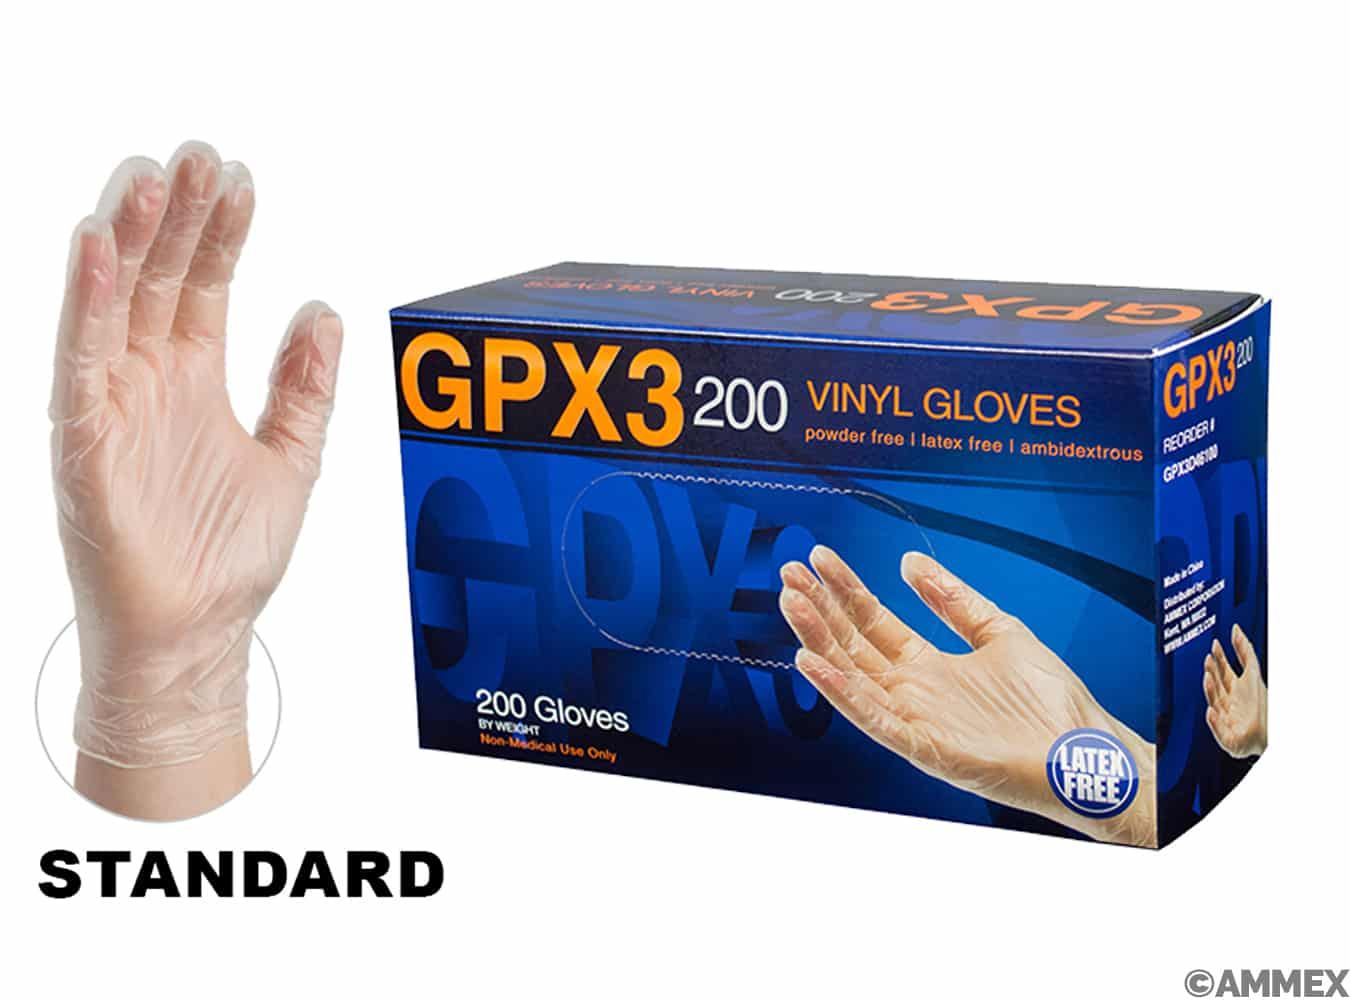 GPX3D_IMAGE-1_MAIN-IMAGE